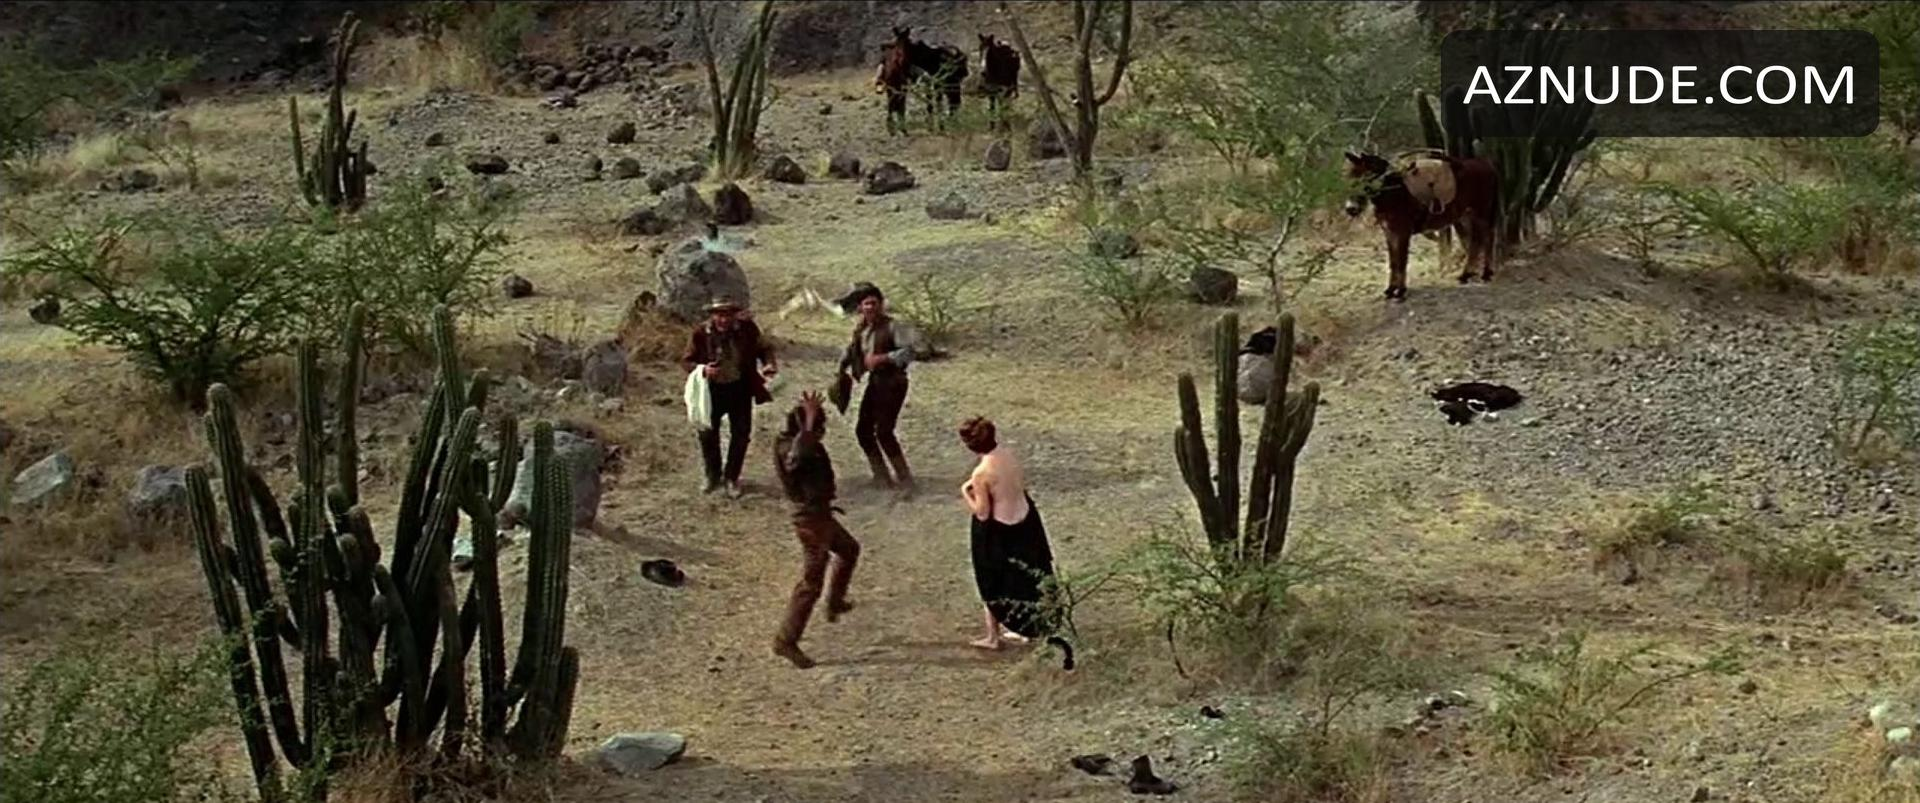 Two Mules For Sister Sara Nude Scenes - Aznude-8950